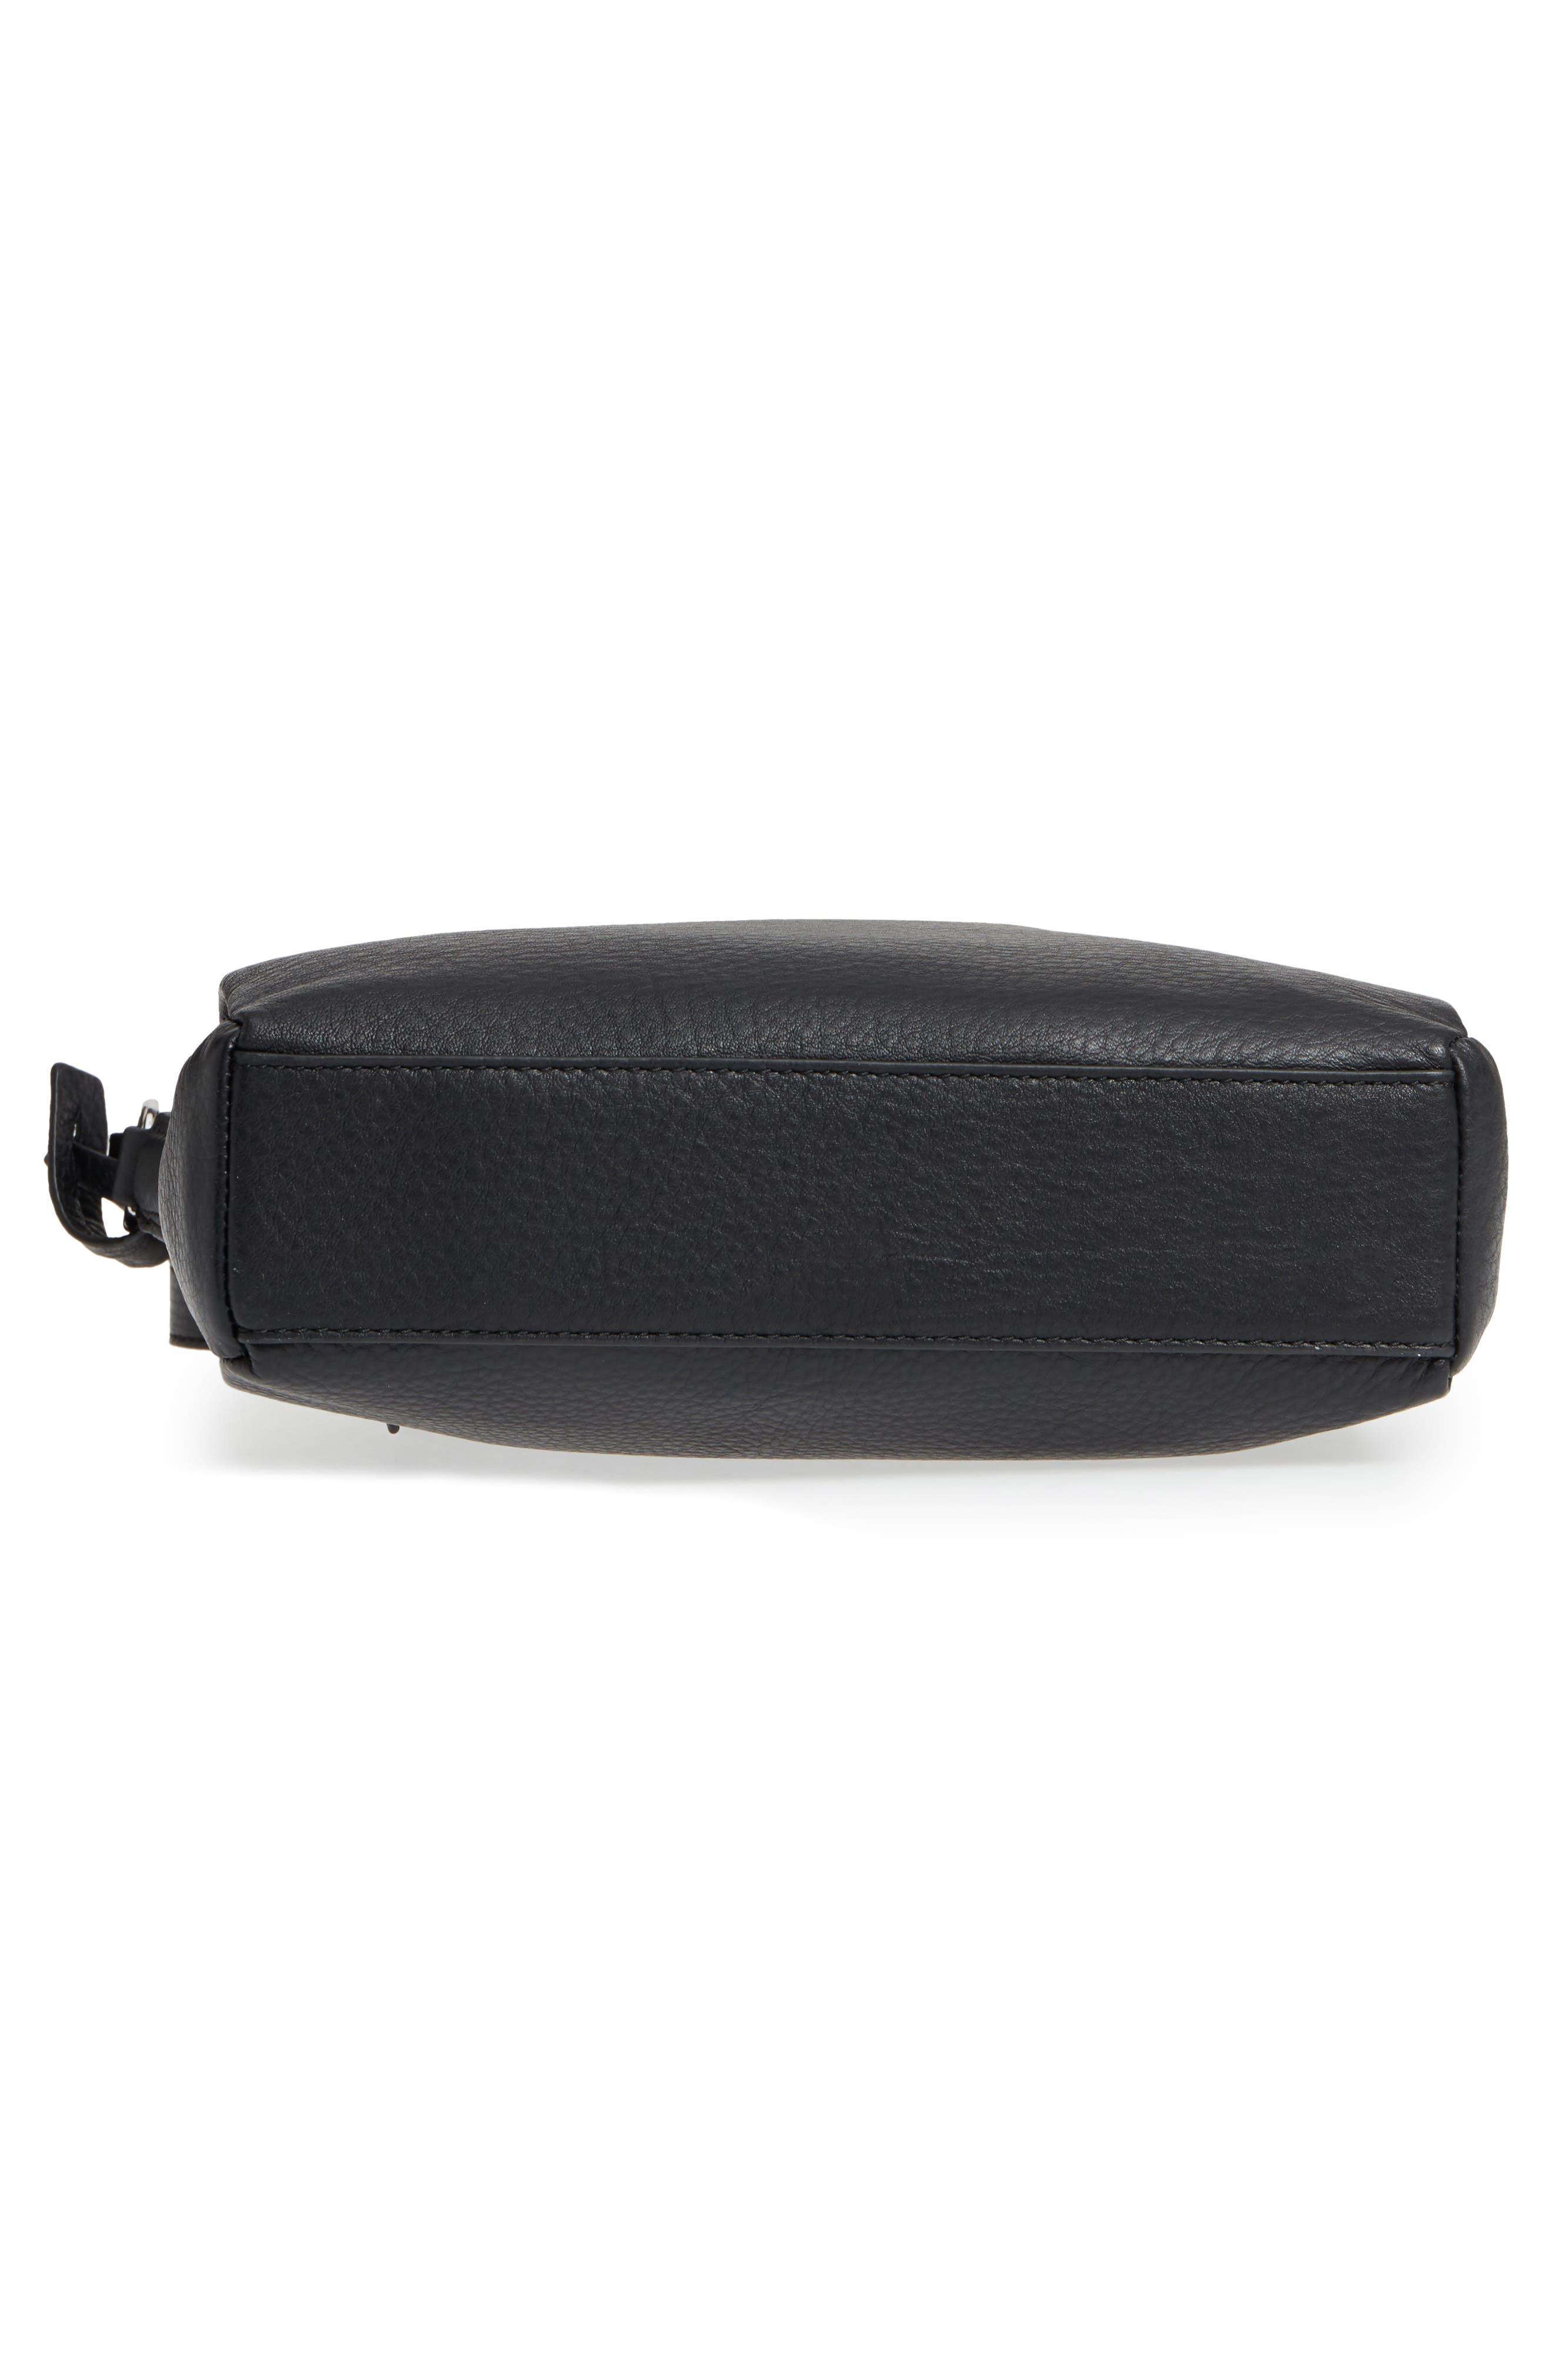 Staja Leather Crossbody Bag,                             Alternate thumbnail 7, color,                             Nero